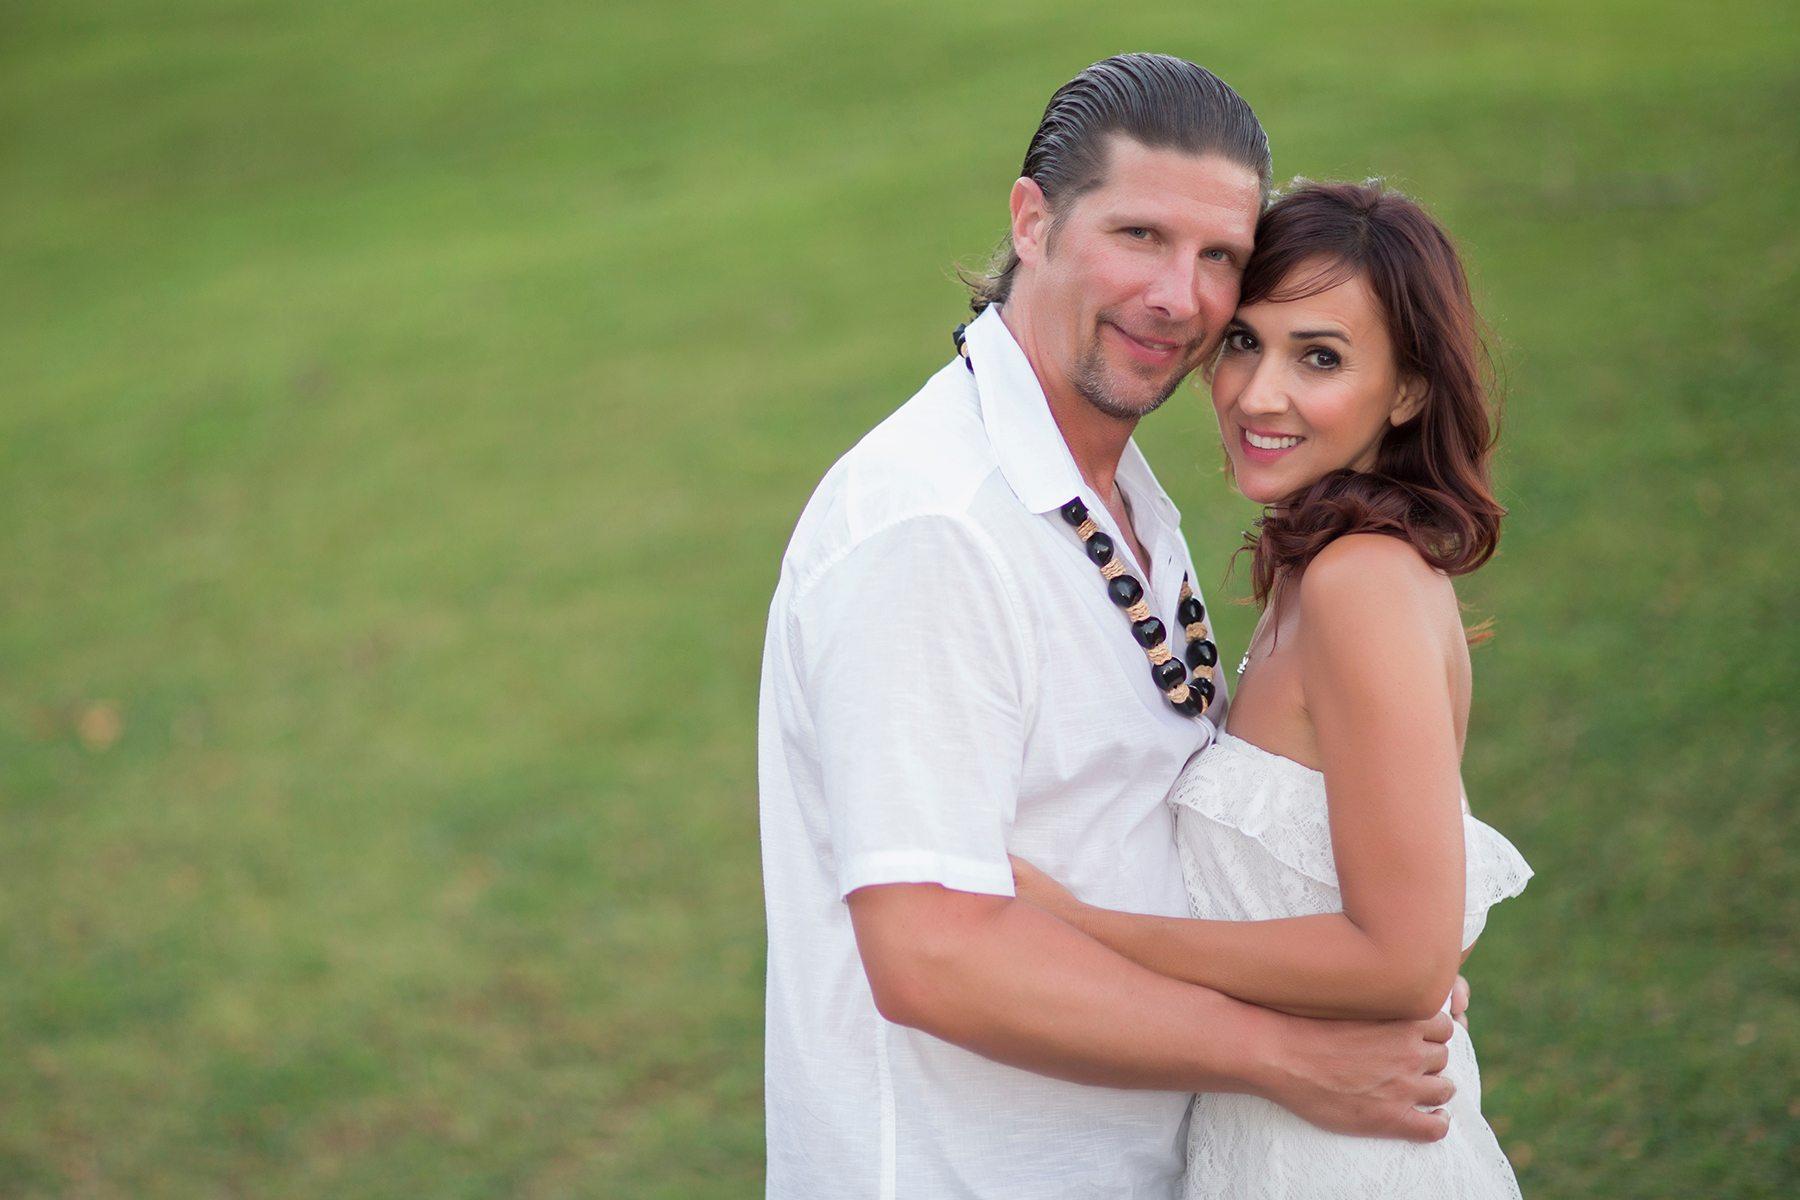 maui couples portaits_Behind The Lens Maui.jpg